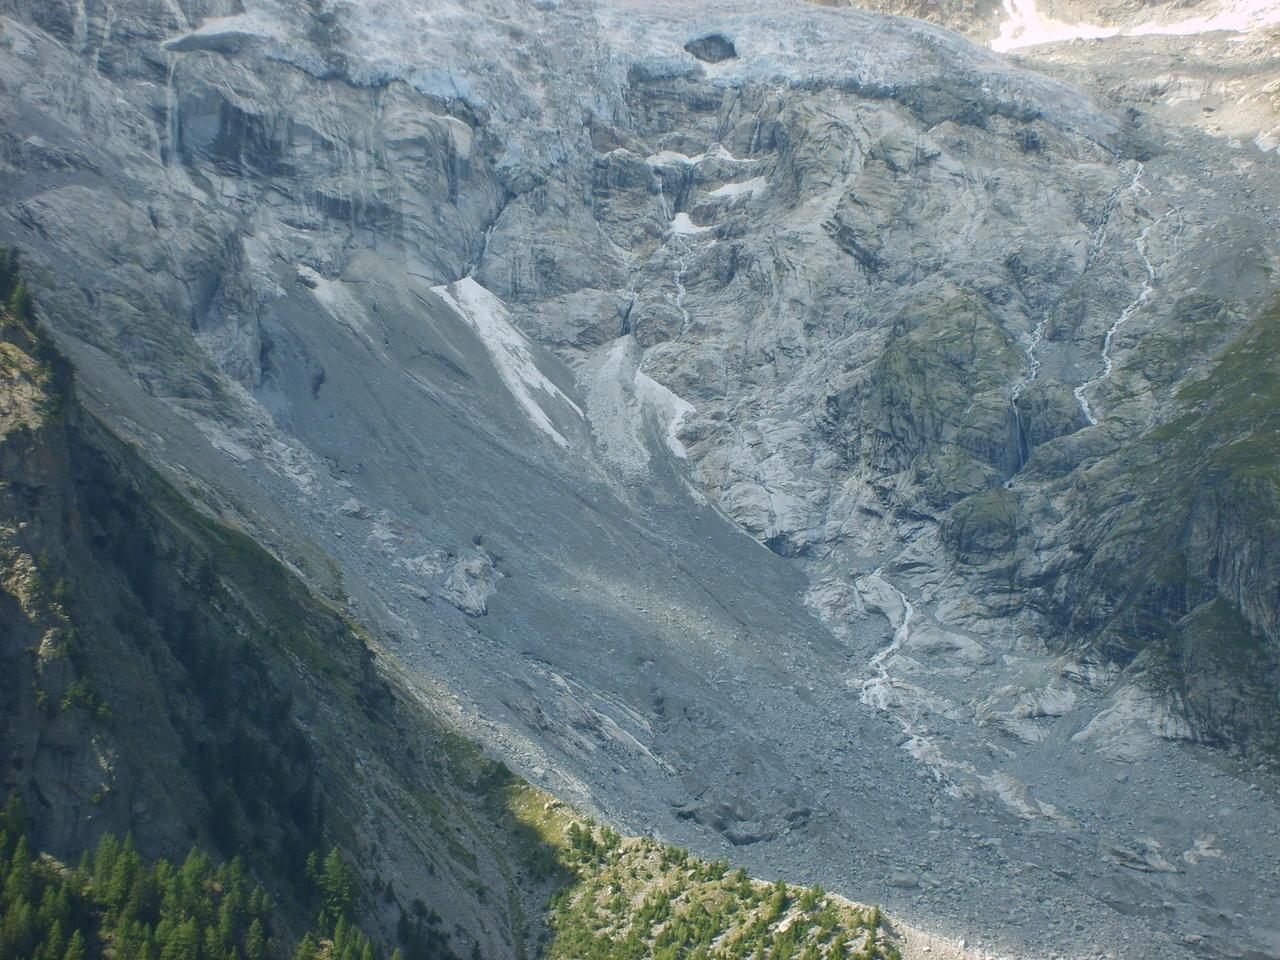 Il Ghiacciaio della Brenva (tesina as.2011/2012)-s5001008.jpg